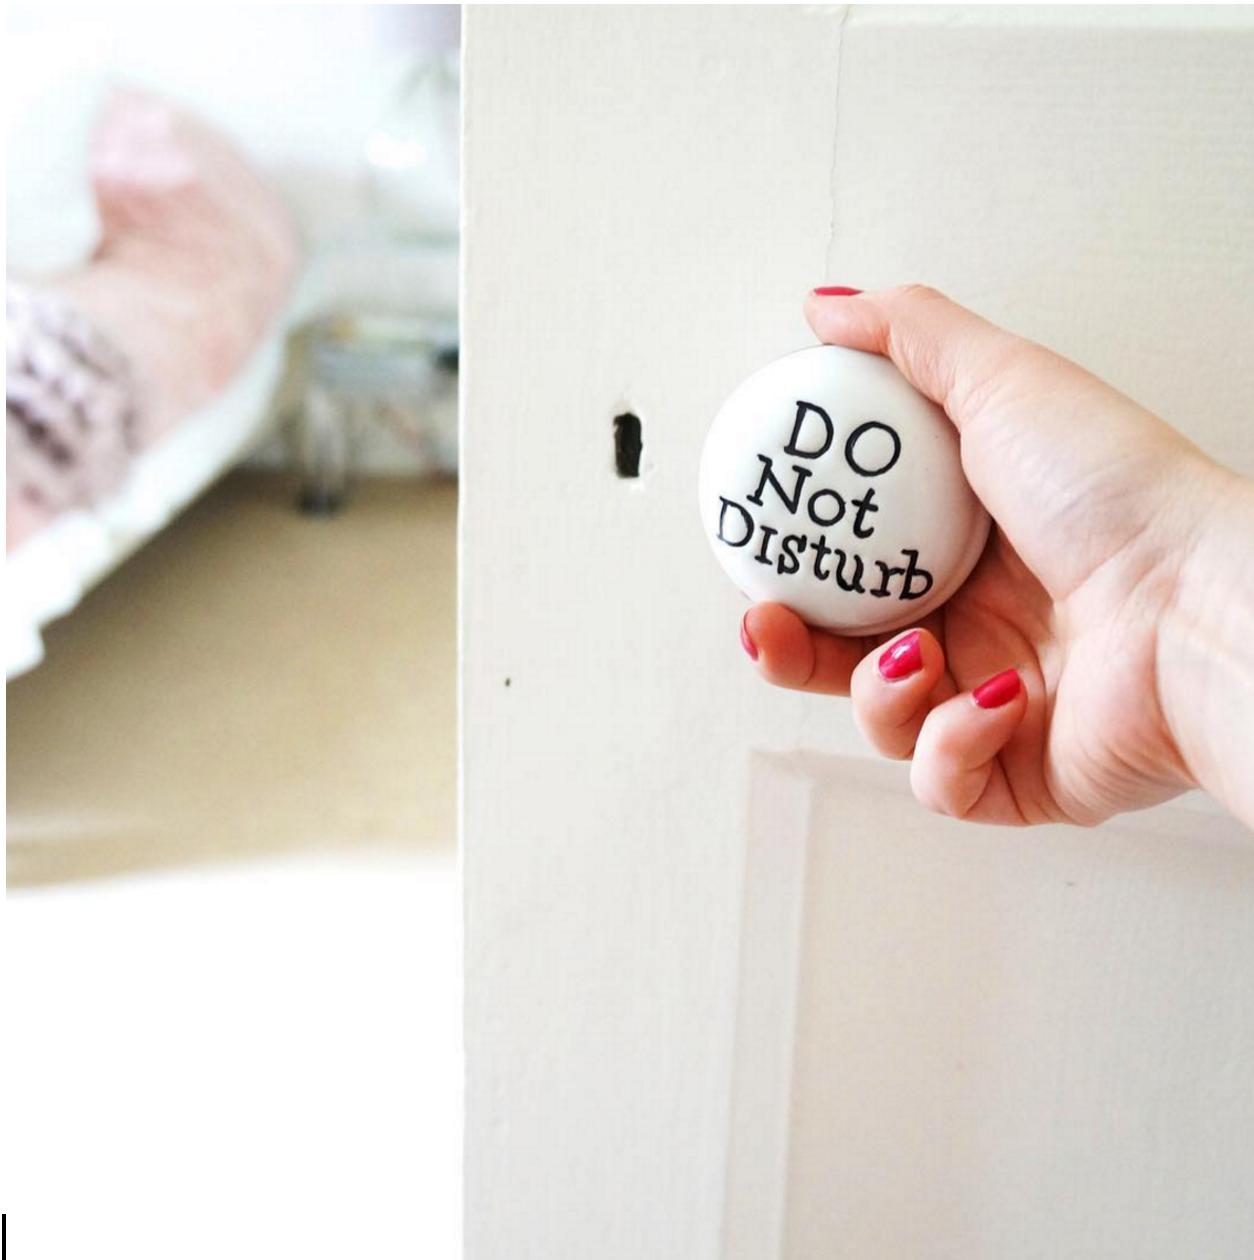 working from home do not disturb doorknob